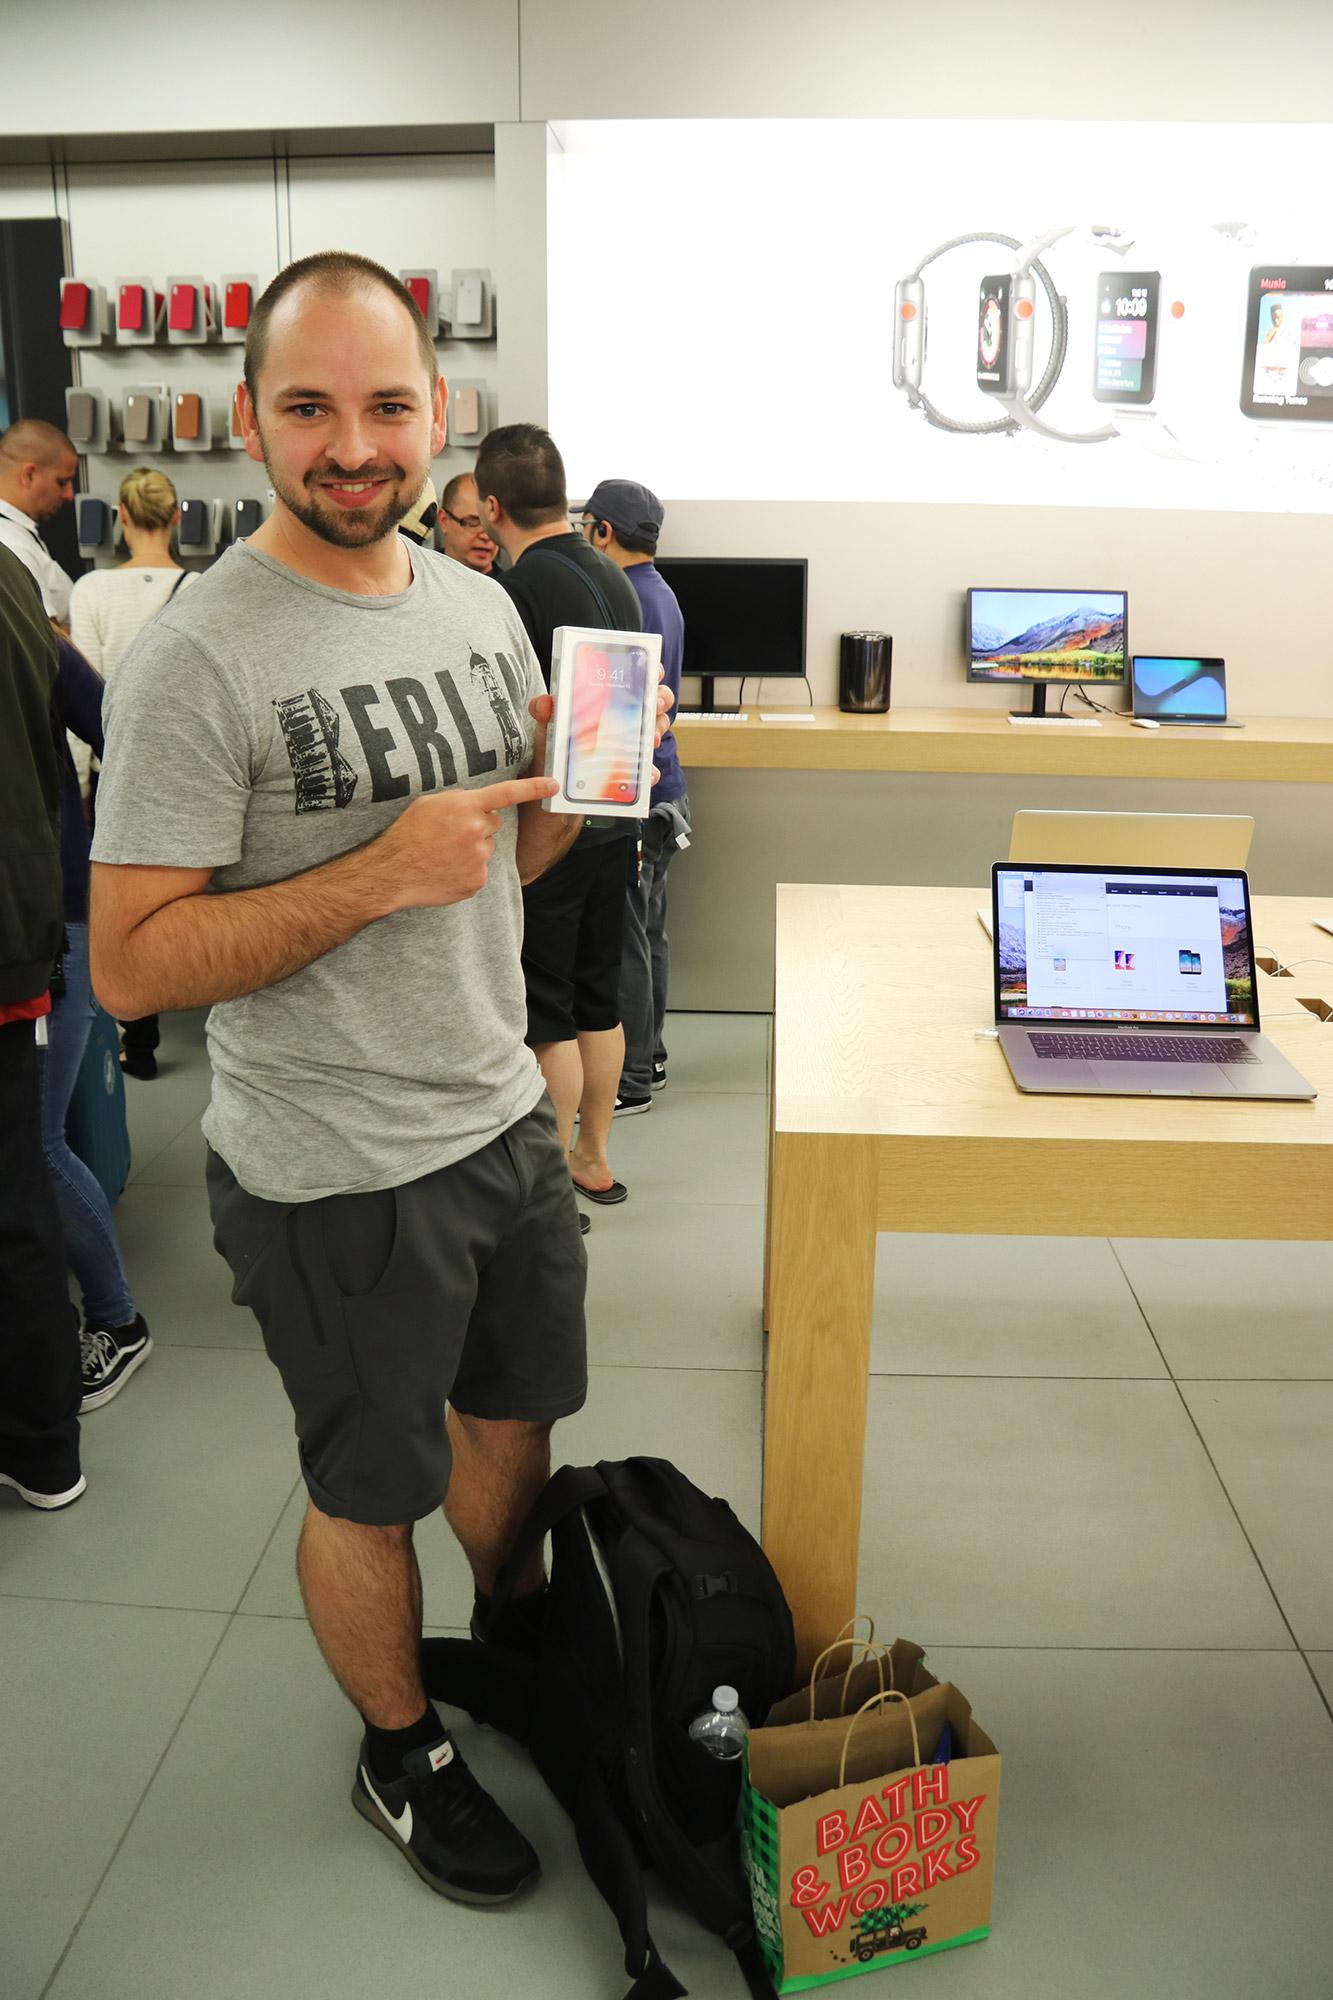 Amerika dag 17 - Las Vegas - iPhone X